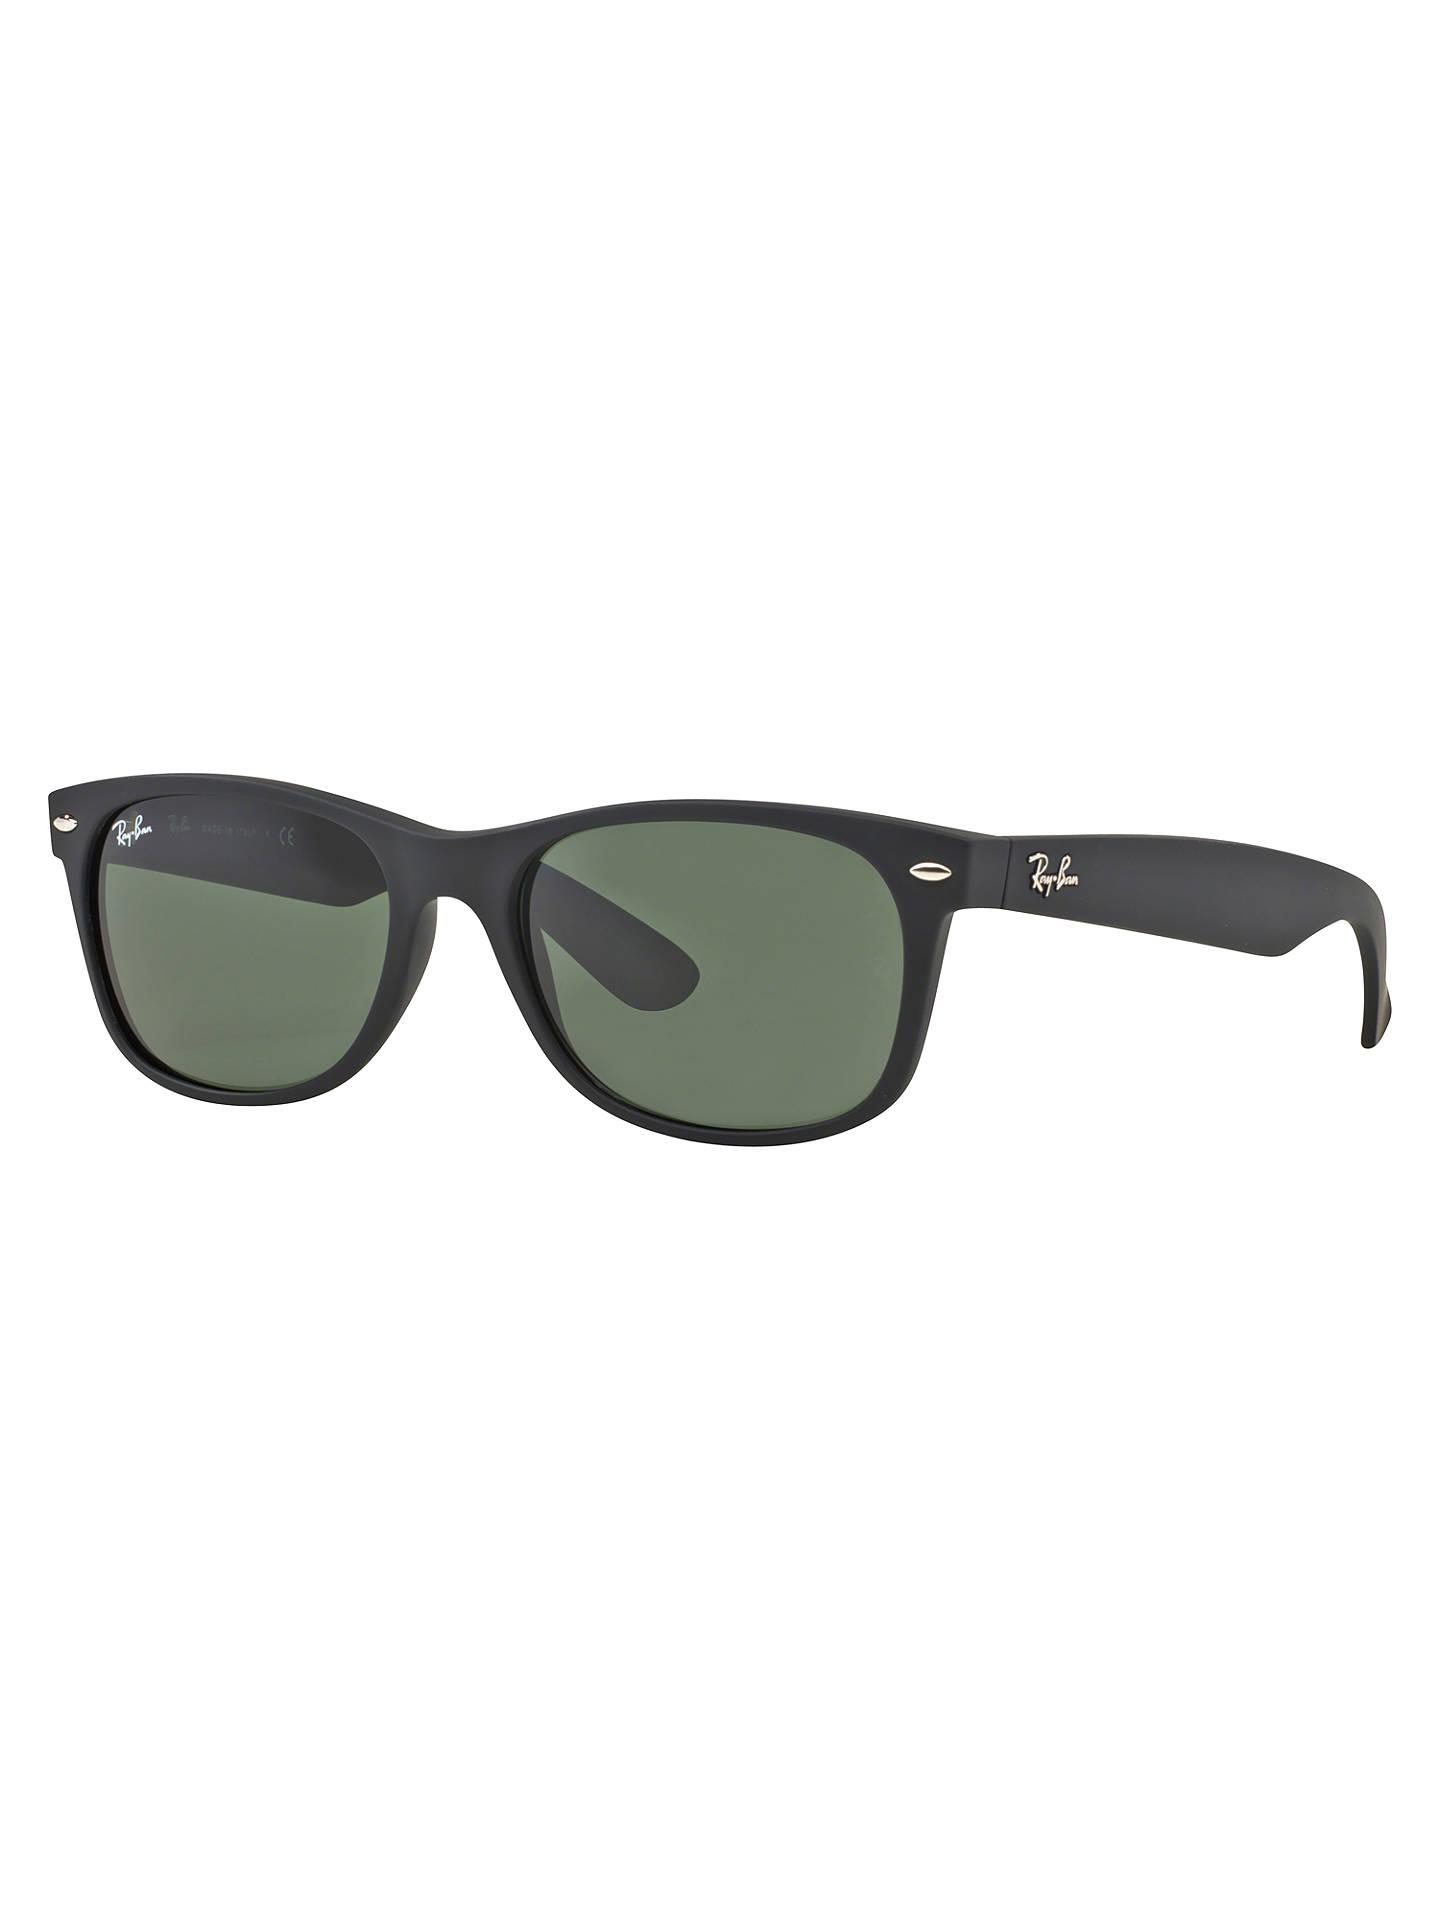 ray ban rb2132 new wayfarer sunglasses at john lewis partners rh johnlewis com